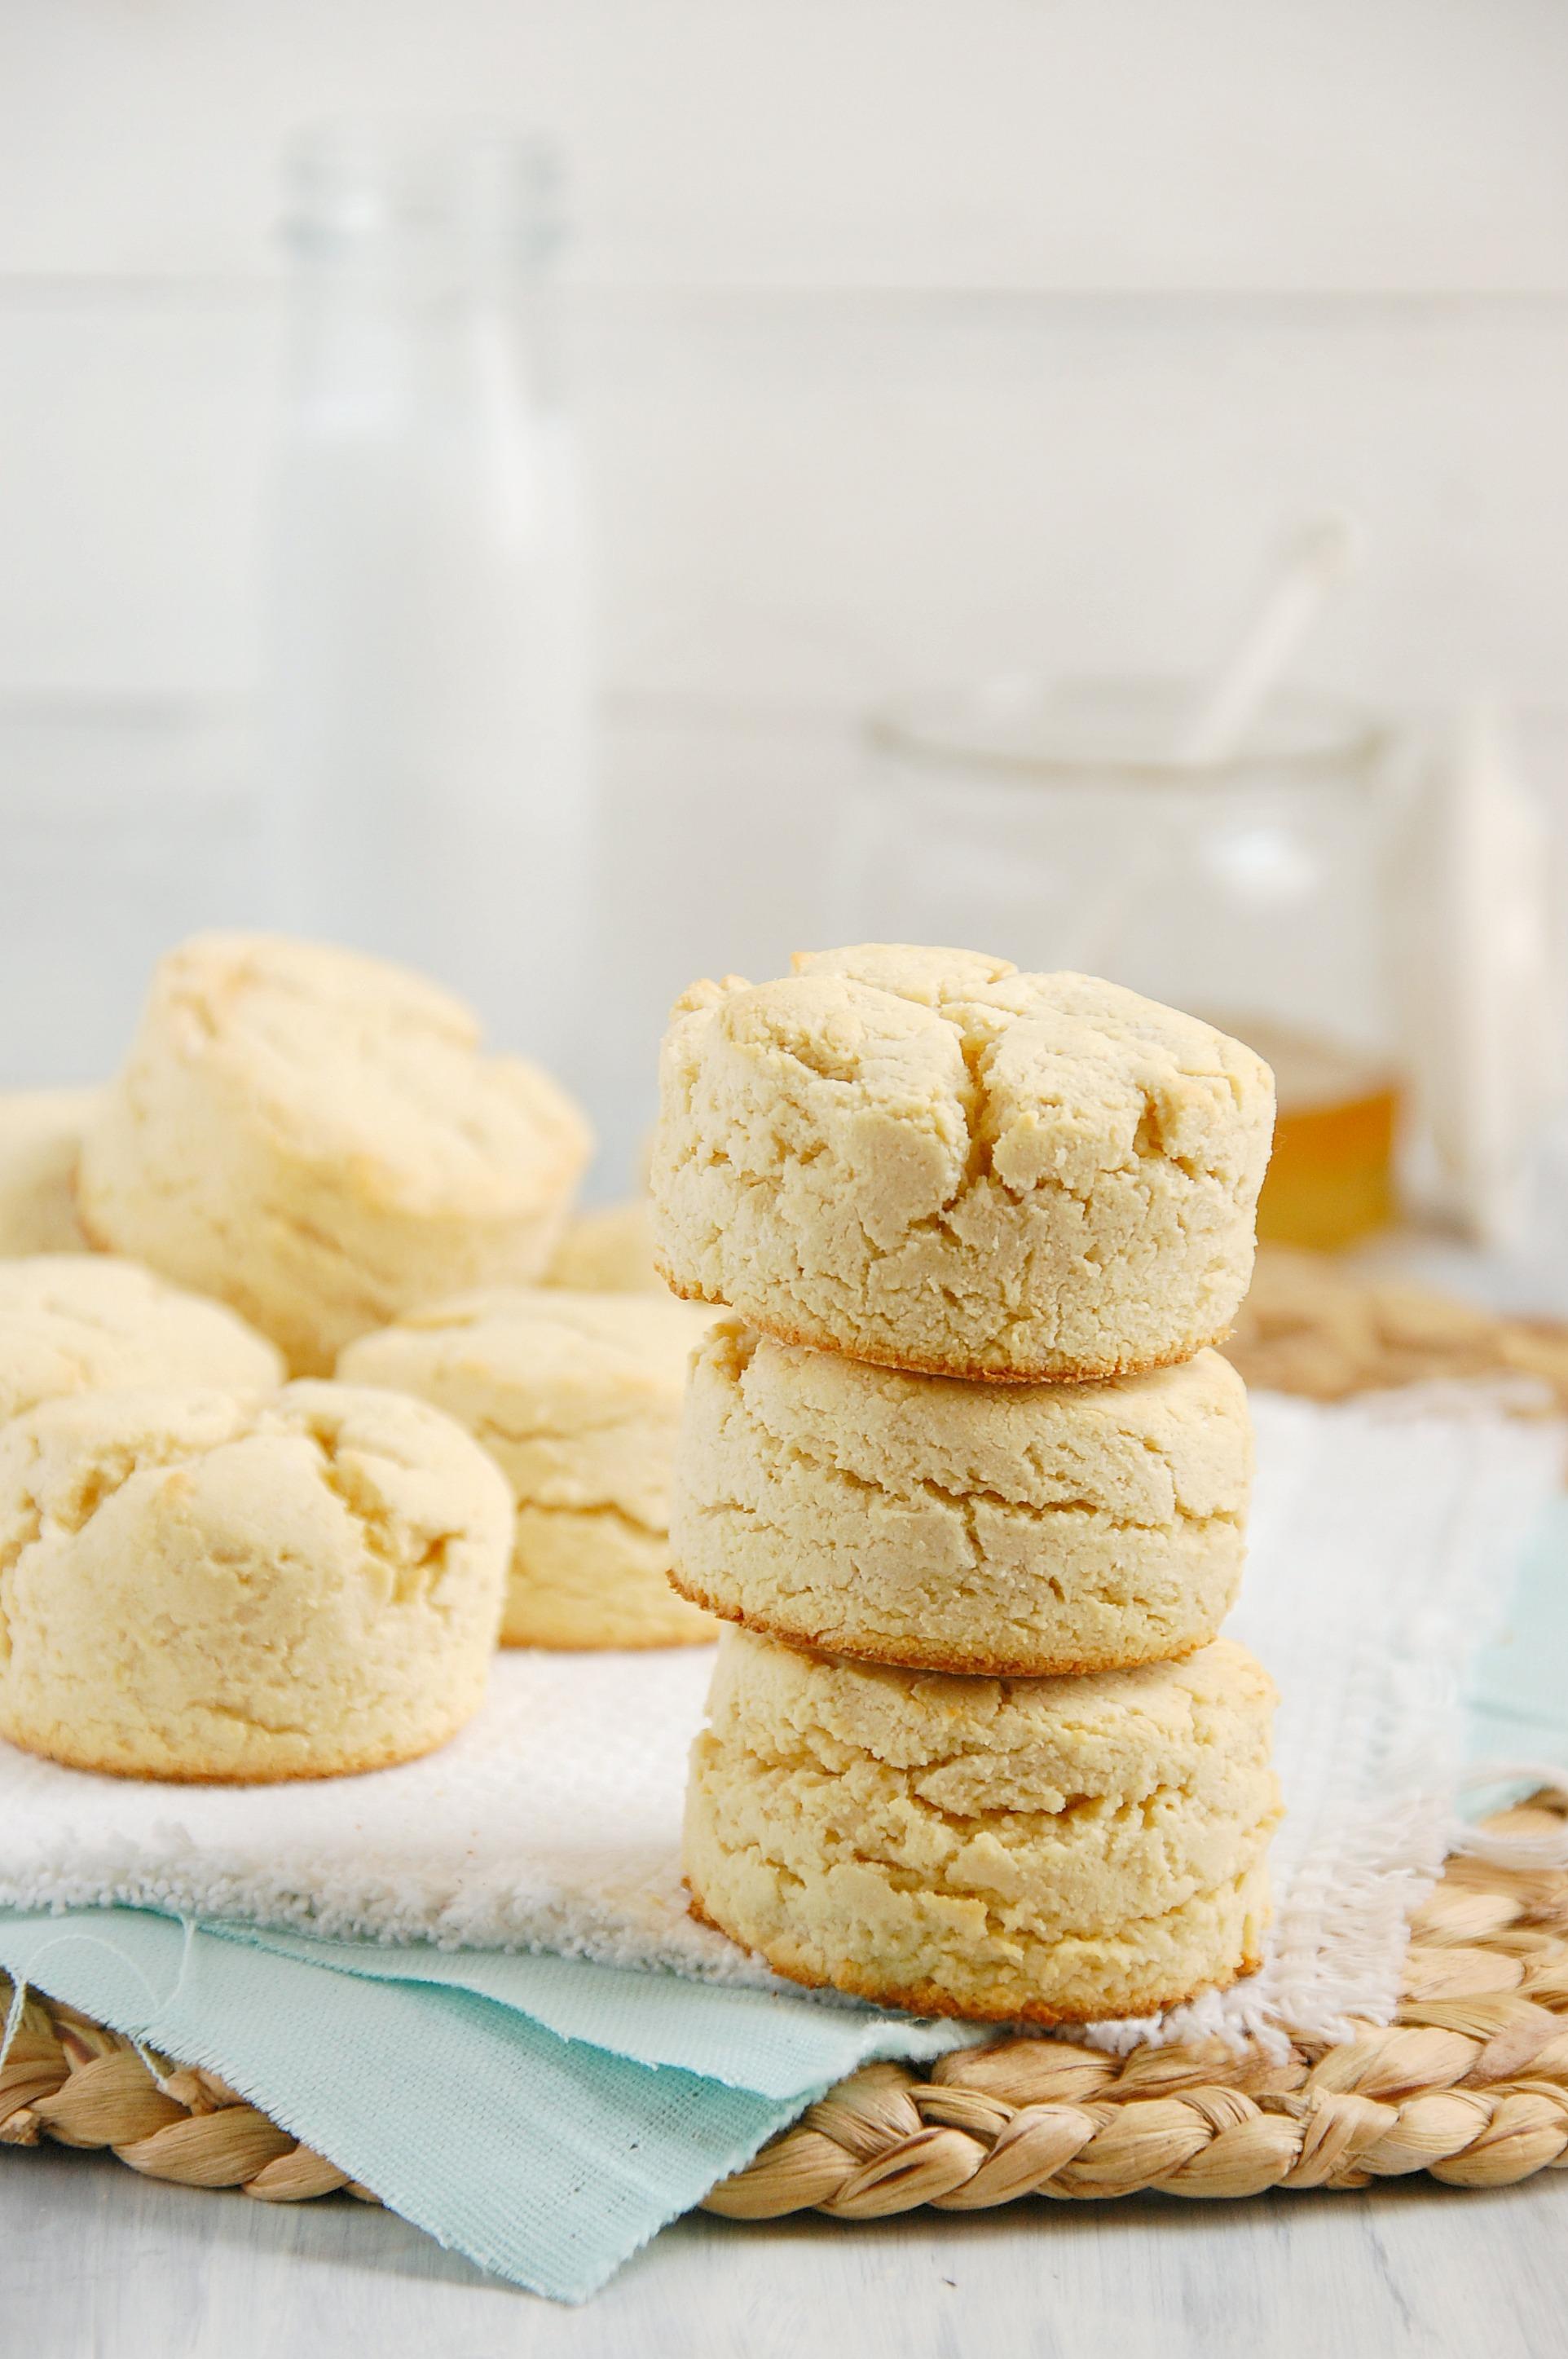 Sweet Potato Biscuits {Gluten-free Dairy-free} - The Kitchen McCabe